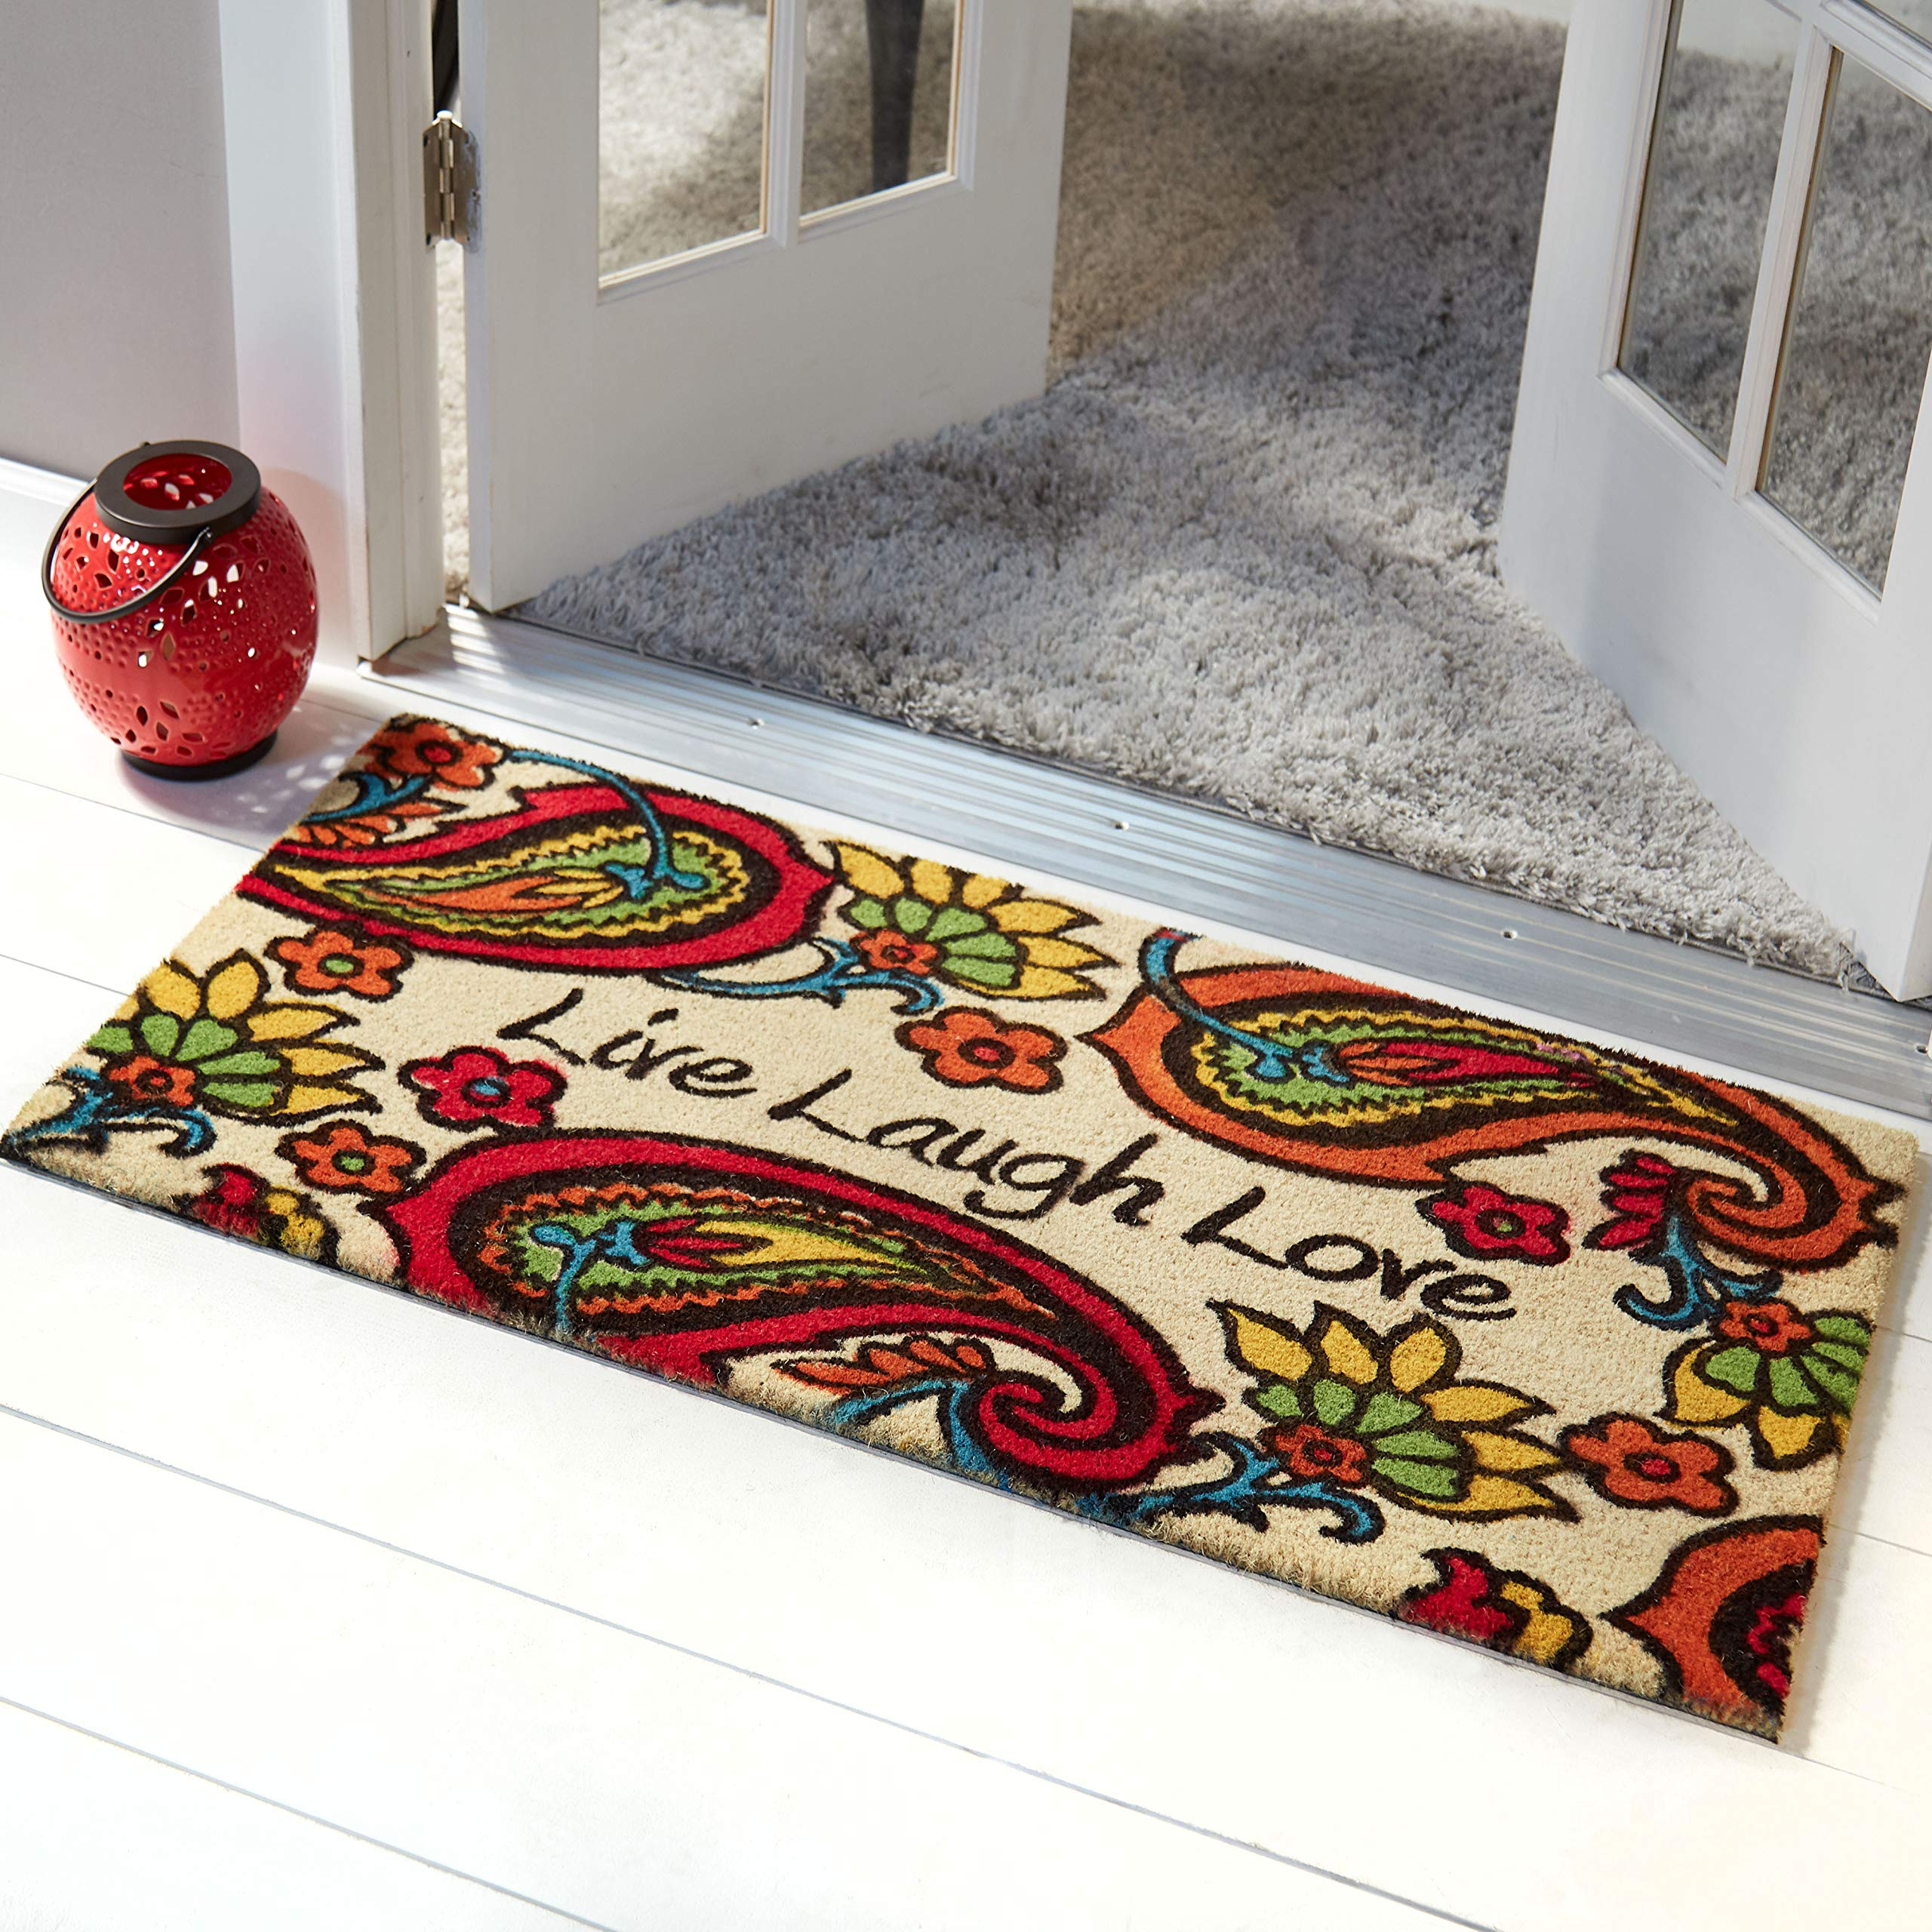 Home Dynamix Nicole Miller Fremont 'Live/Laugh/Love' Coco Coir Outdoor Door Mat 22''x47'', Paisley Orange/Red/Gold Multi